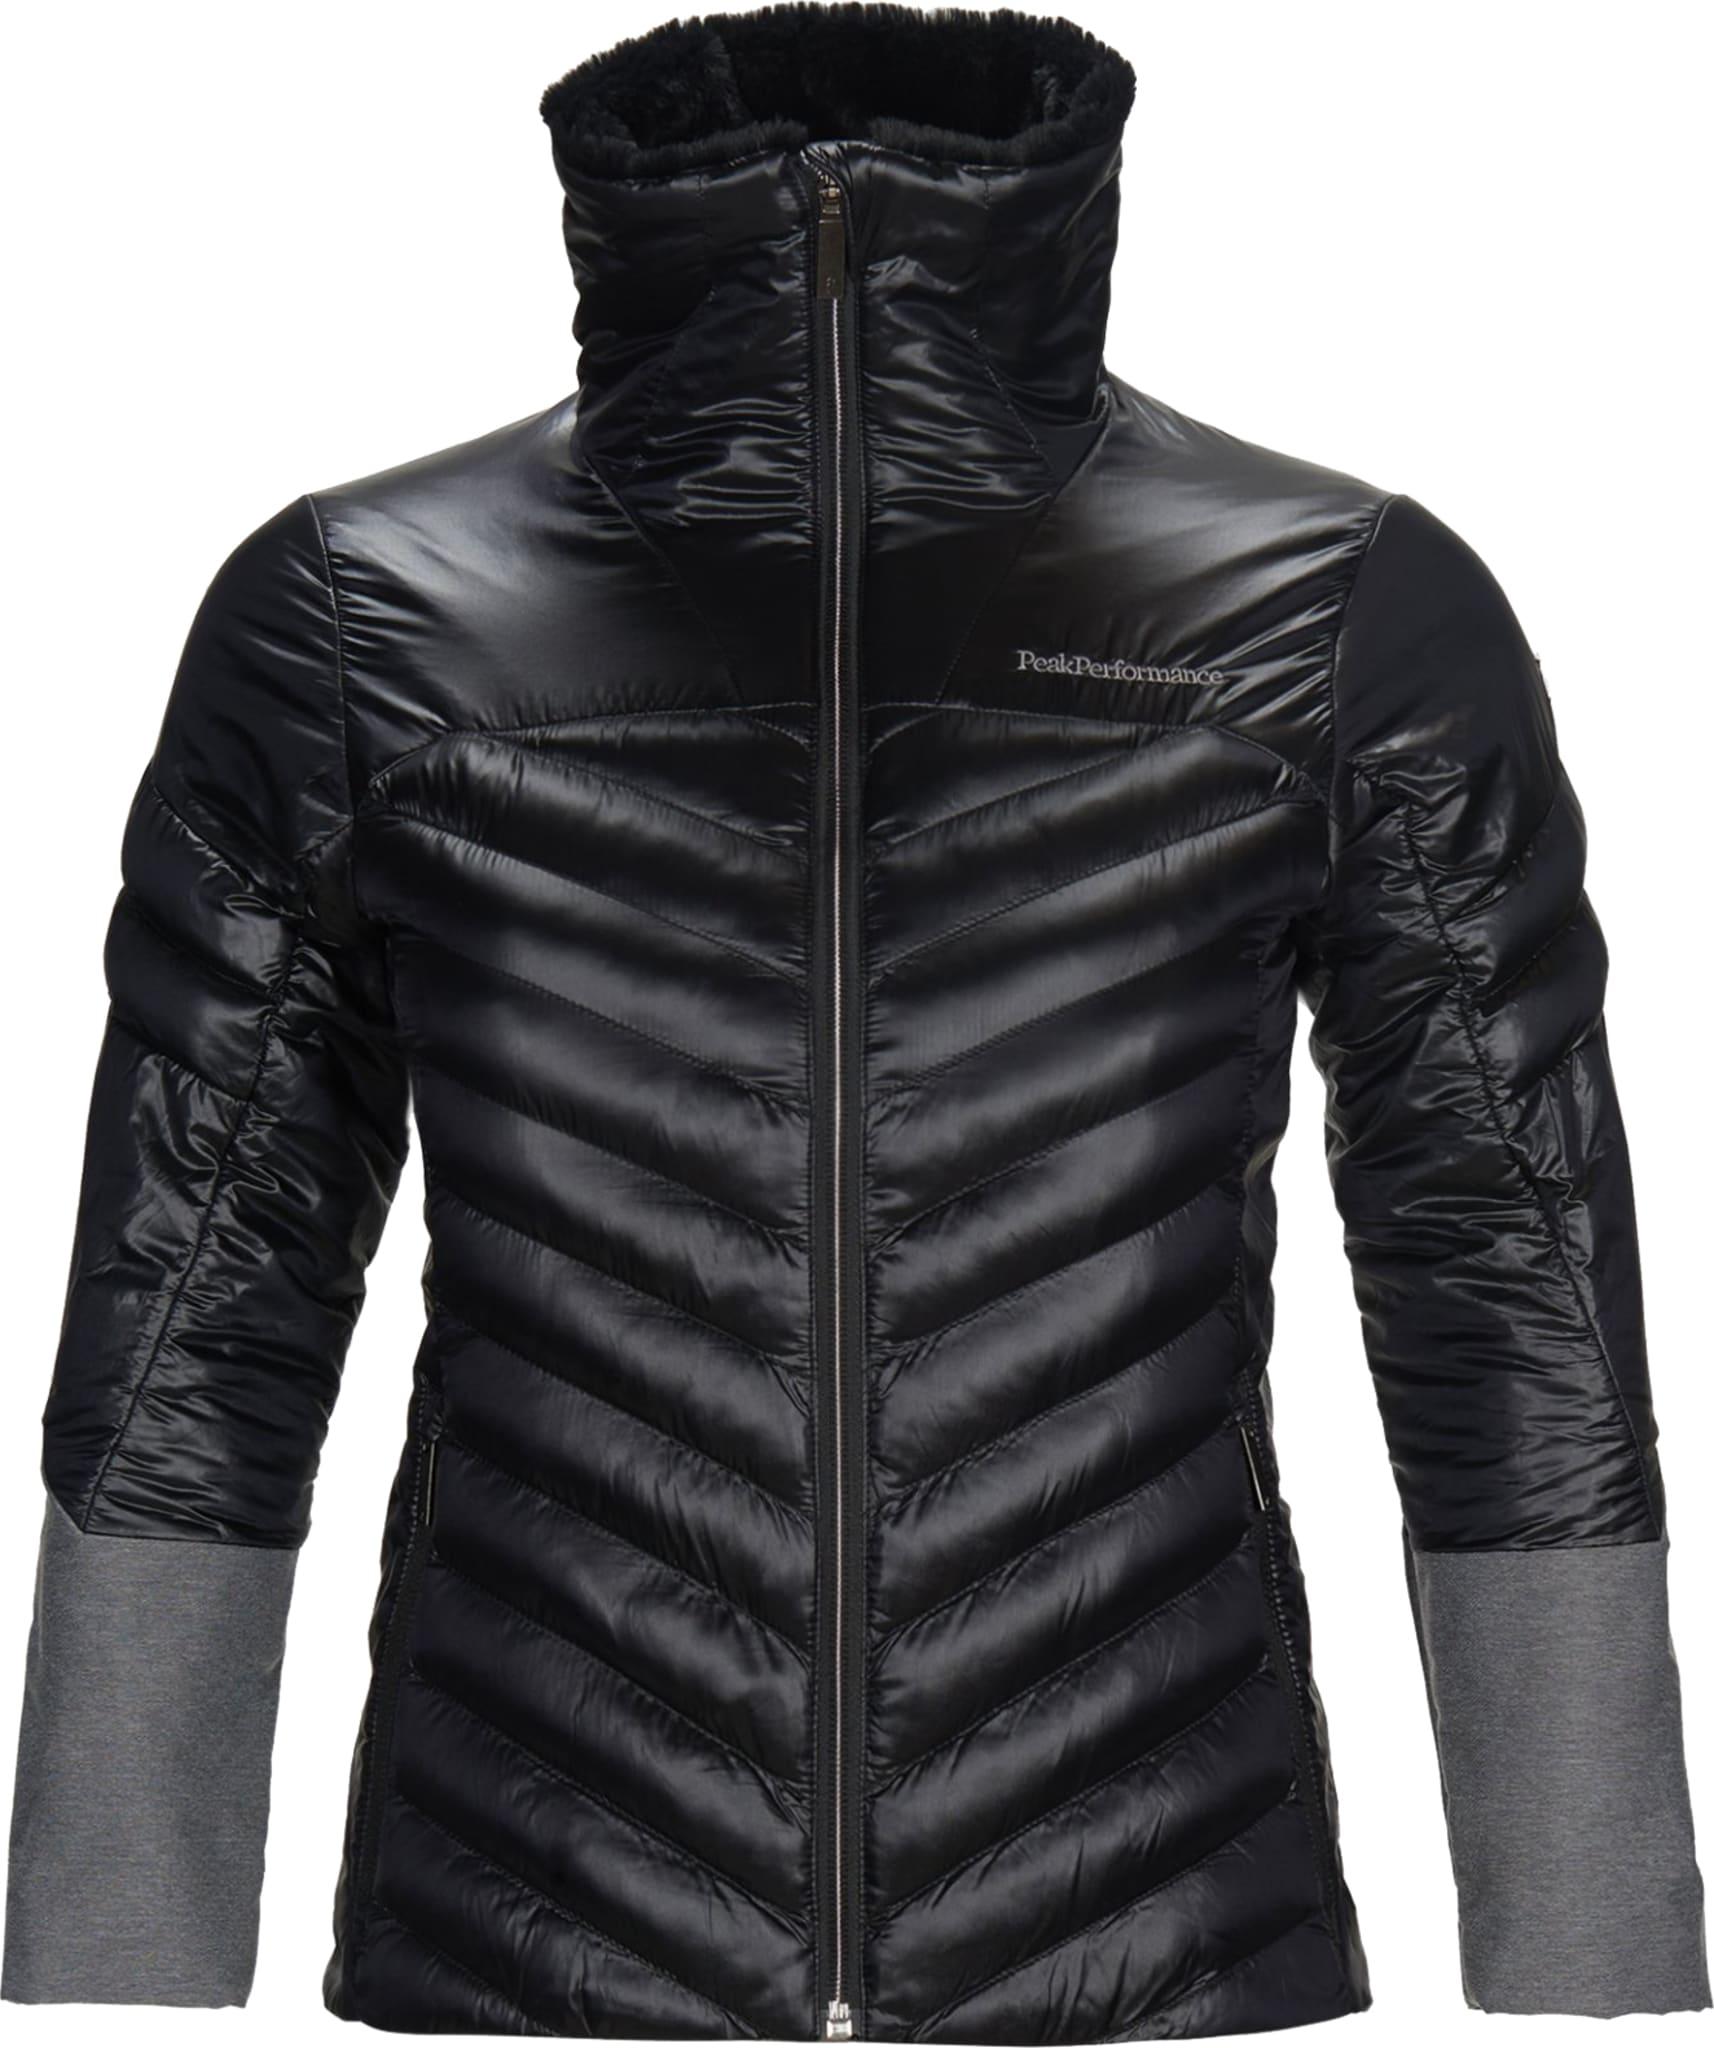 Velaero Jacket W